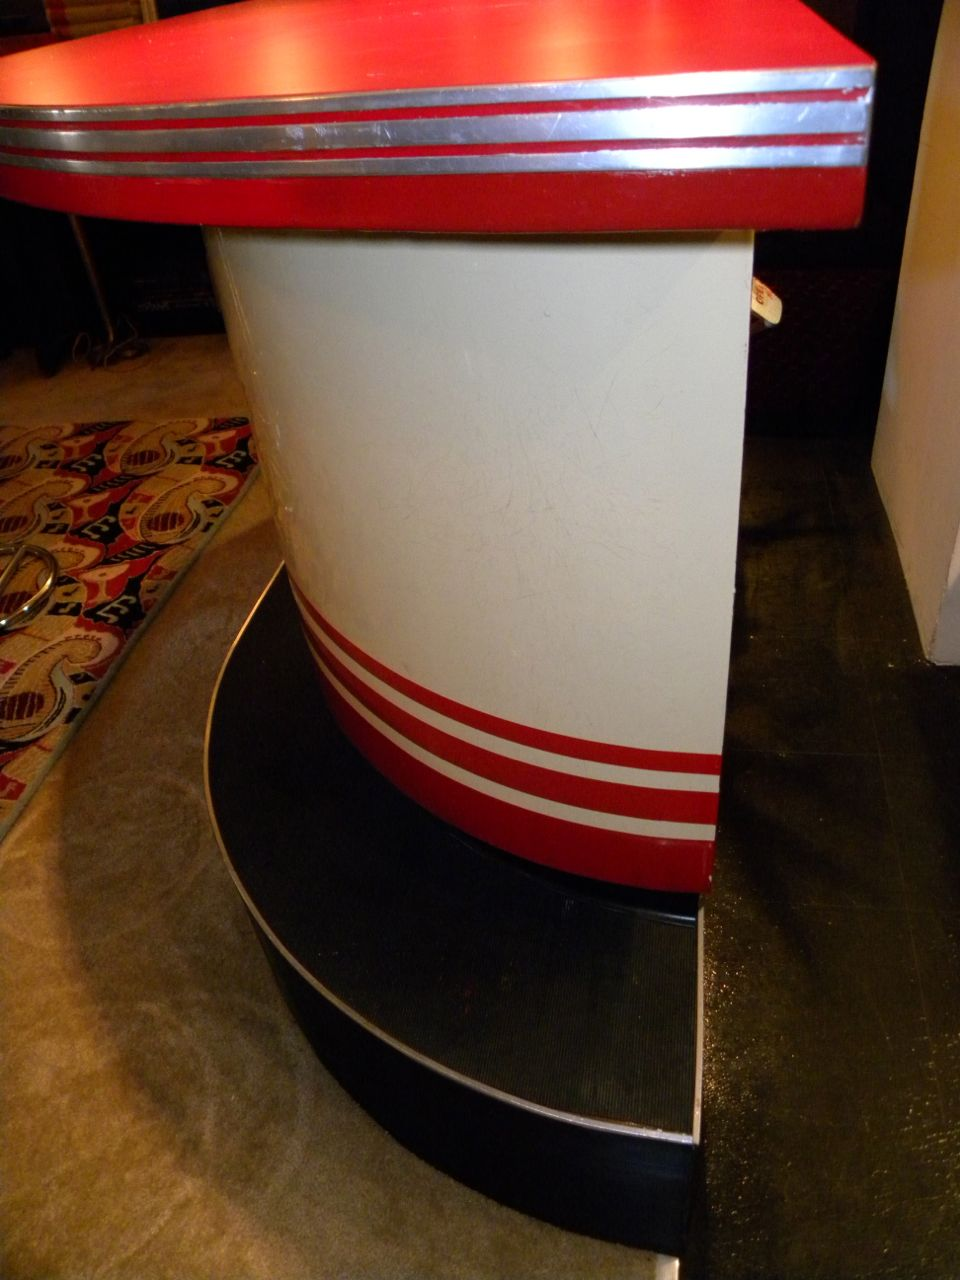 Art Deco Streamline Modern Bar with matching stools Bars  : 1789g from artdecocollection.com size 960 x 1280 jpeg 128kB